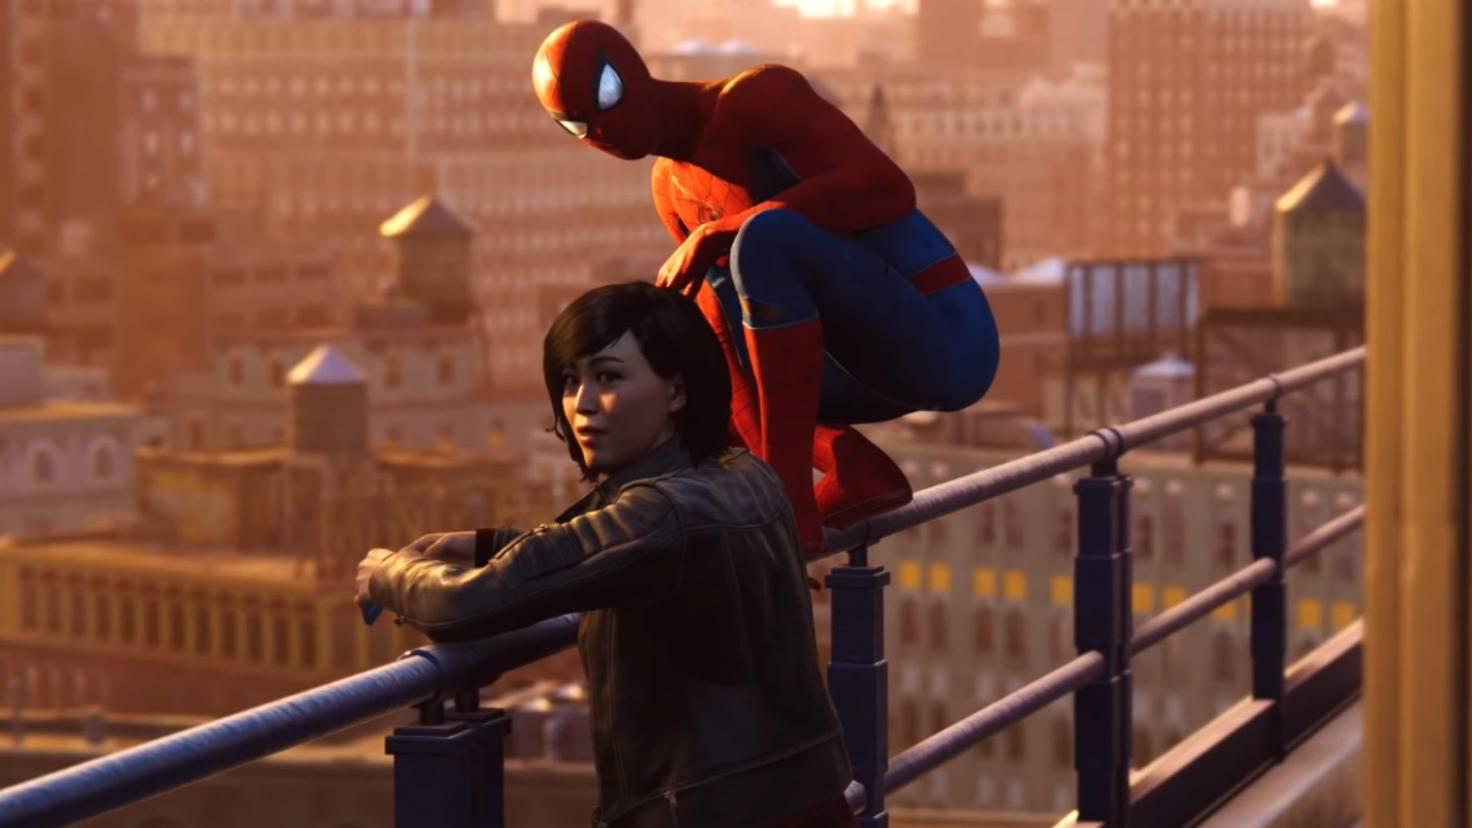 spider-man-ps4-yuri-screenshot